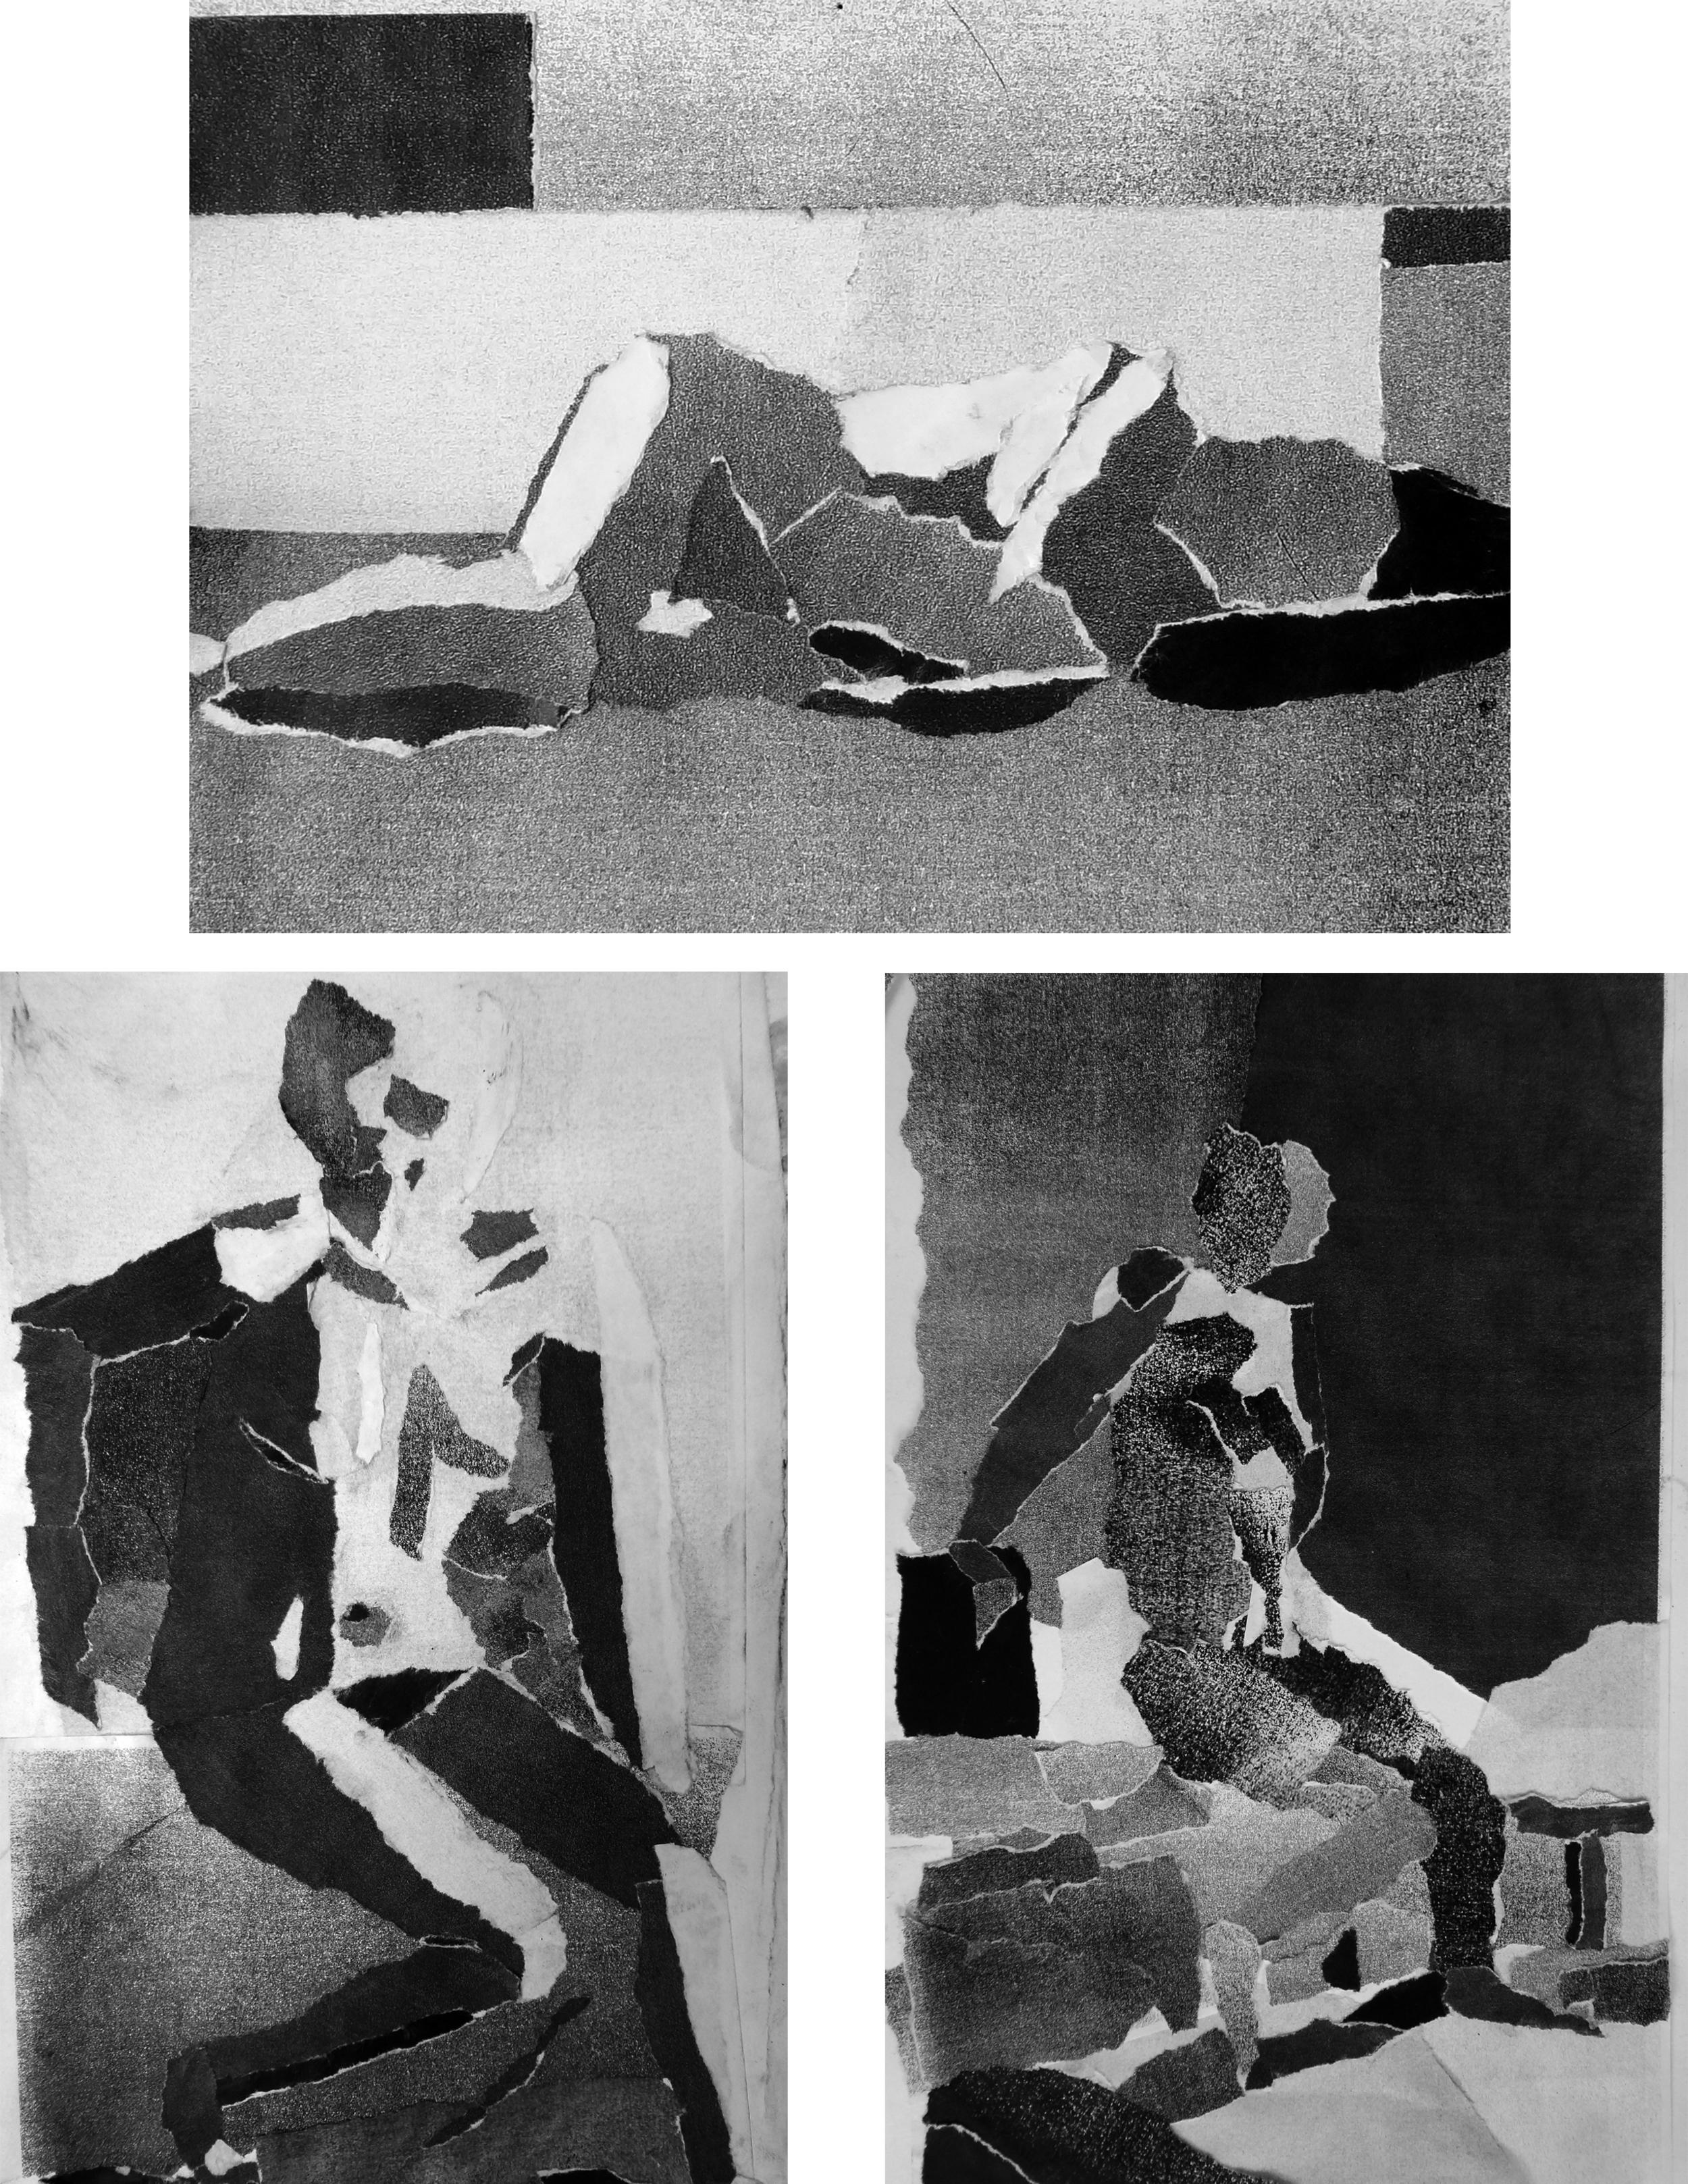 83-Collagefigures.jpg